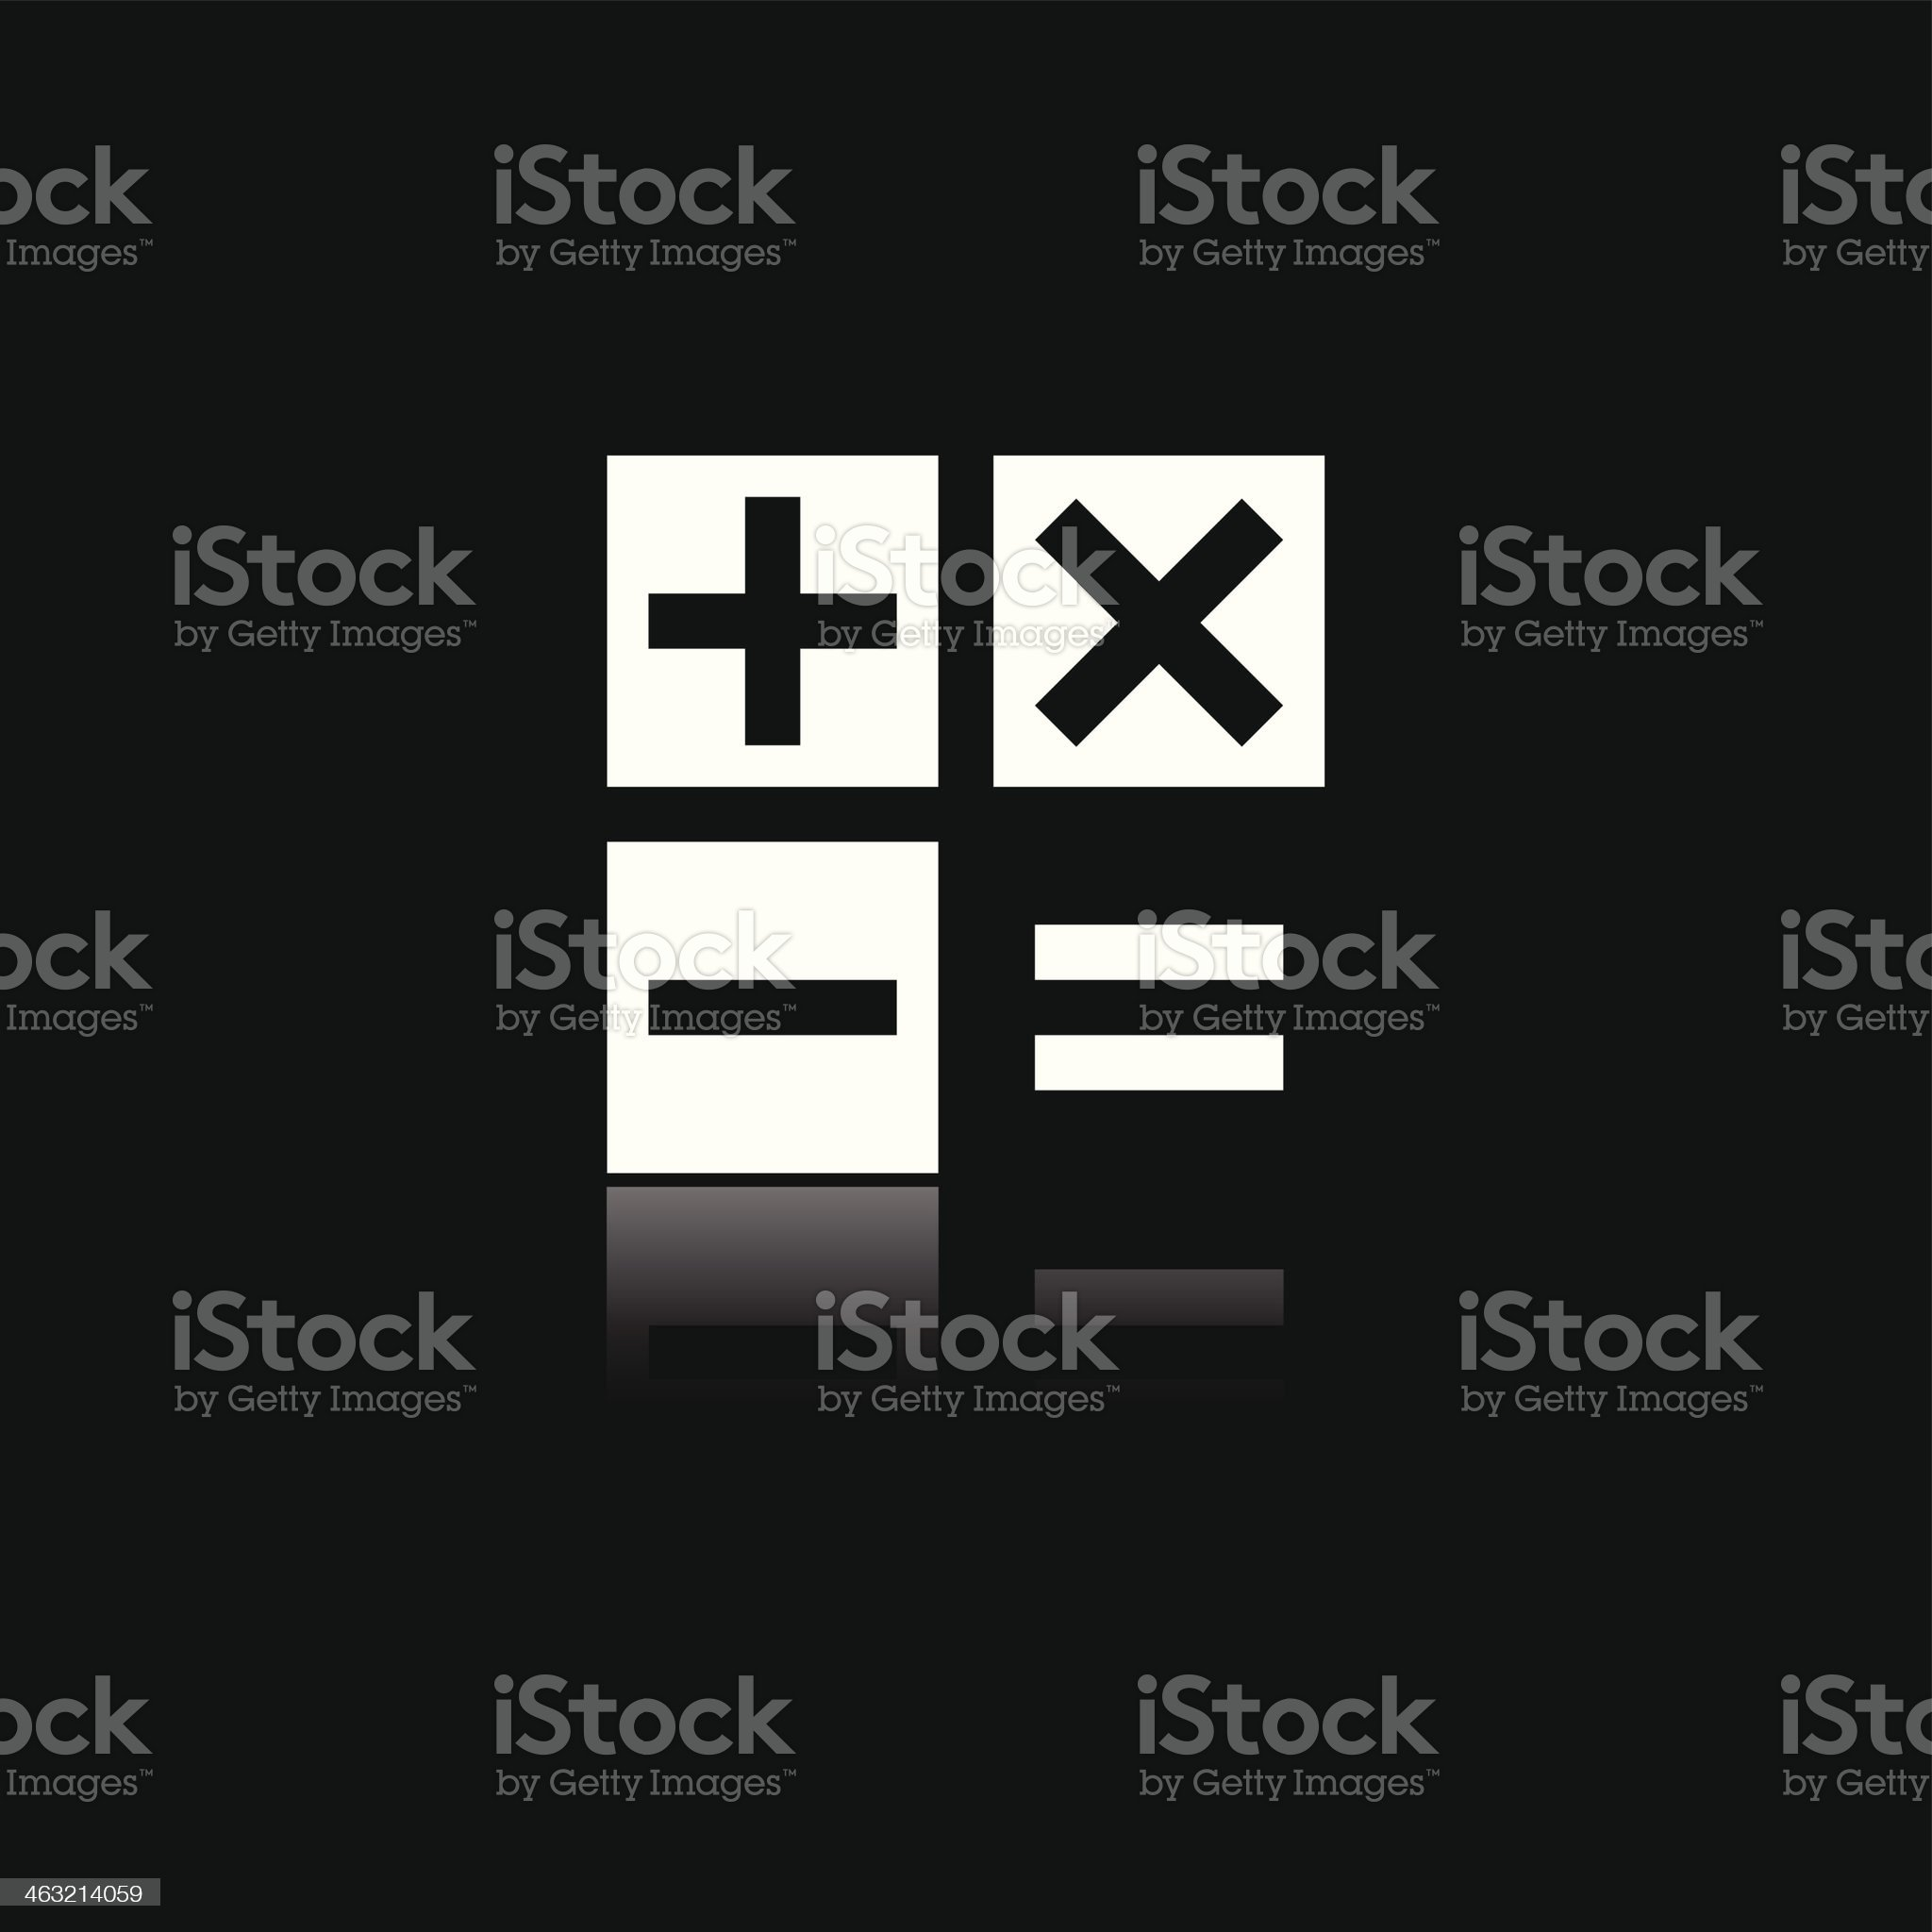 Calculator icon royalty-free stock vector art